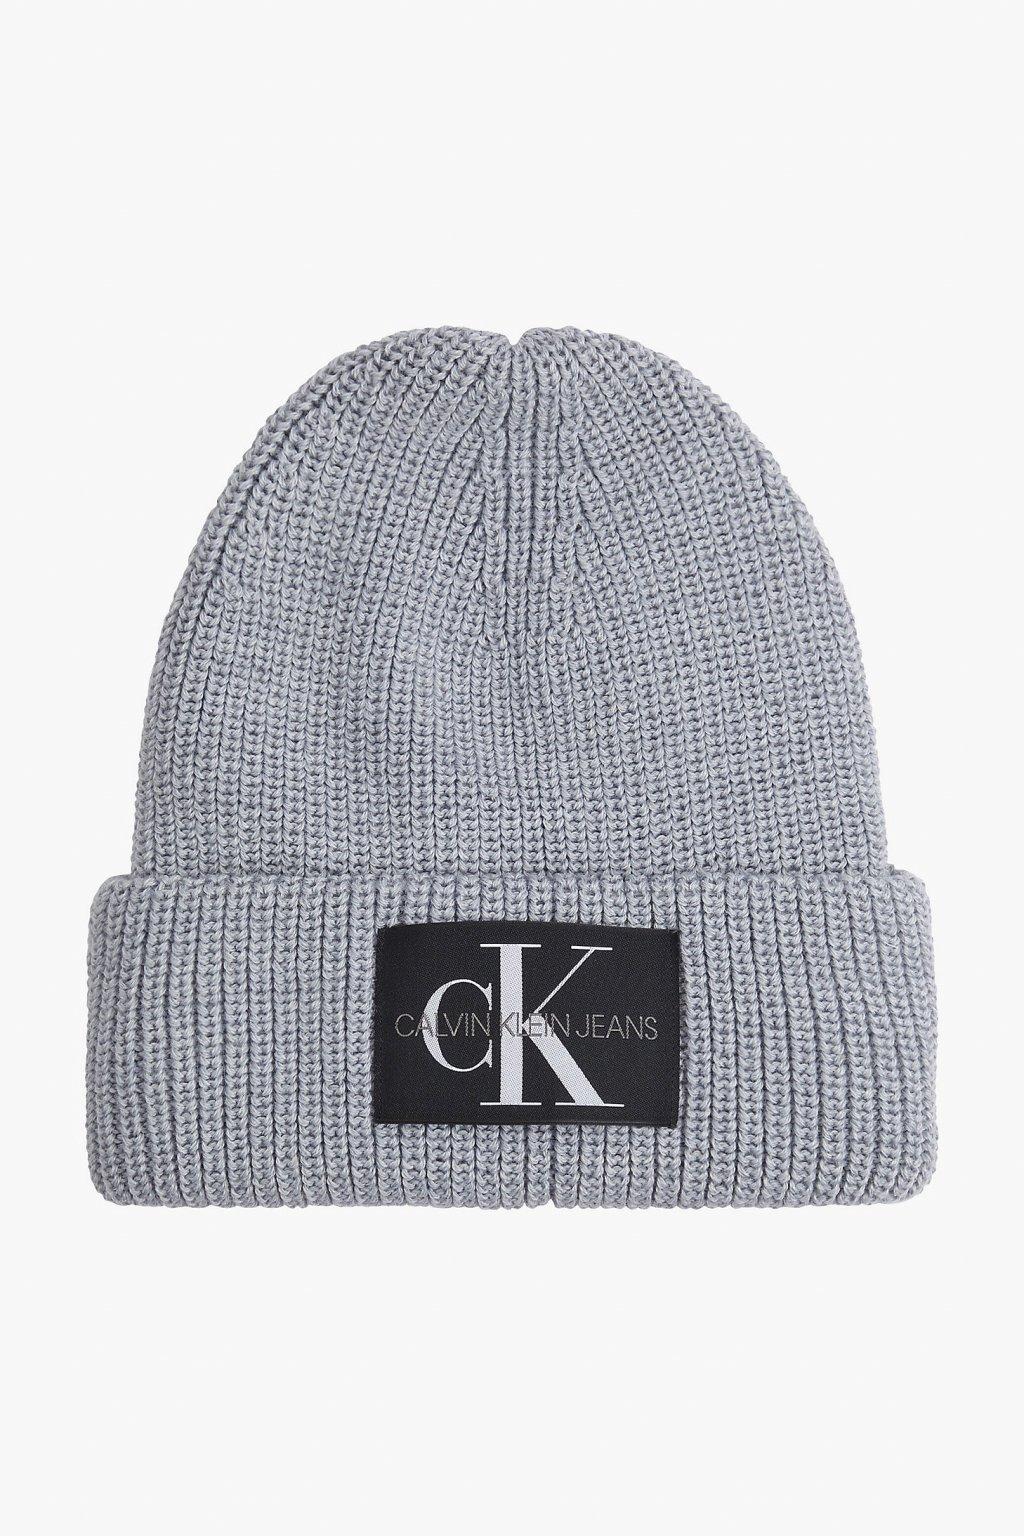 Calvin Klein Jeans čepice dámská- šedá